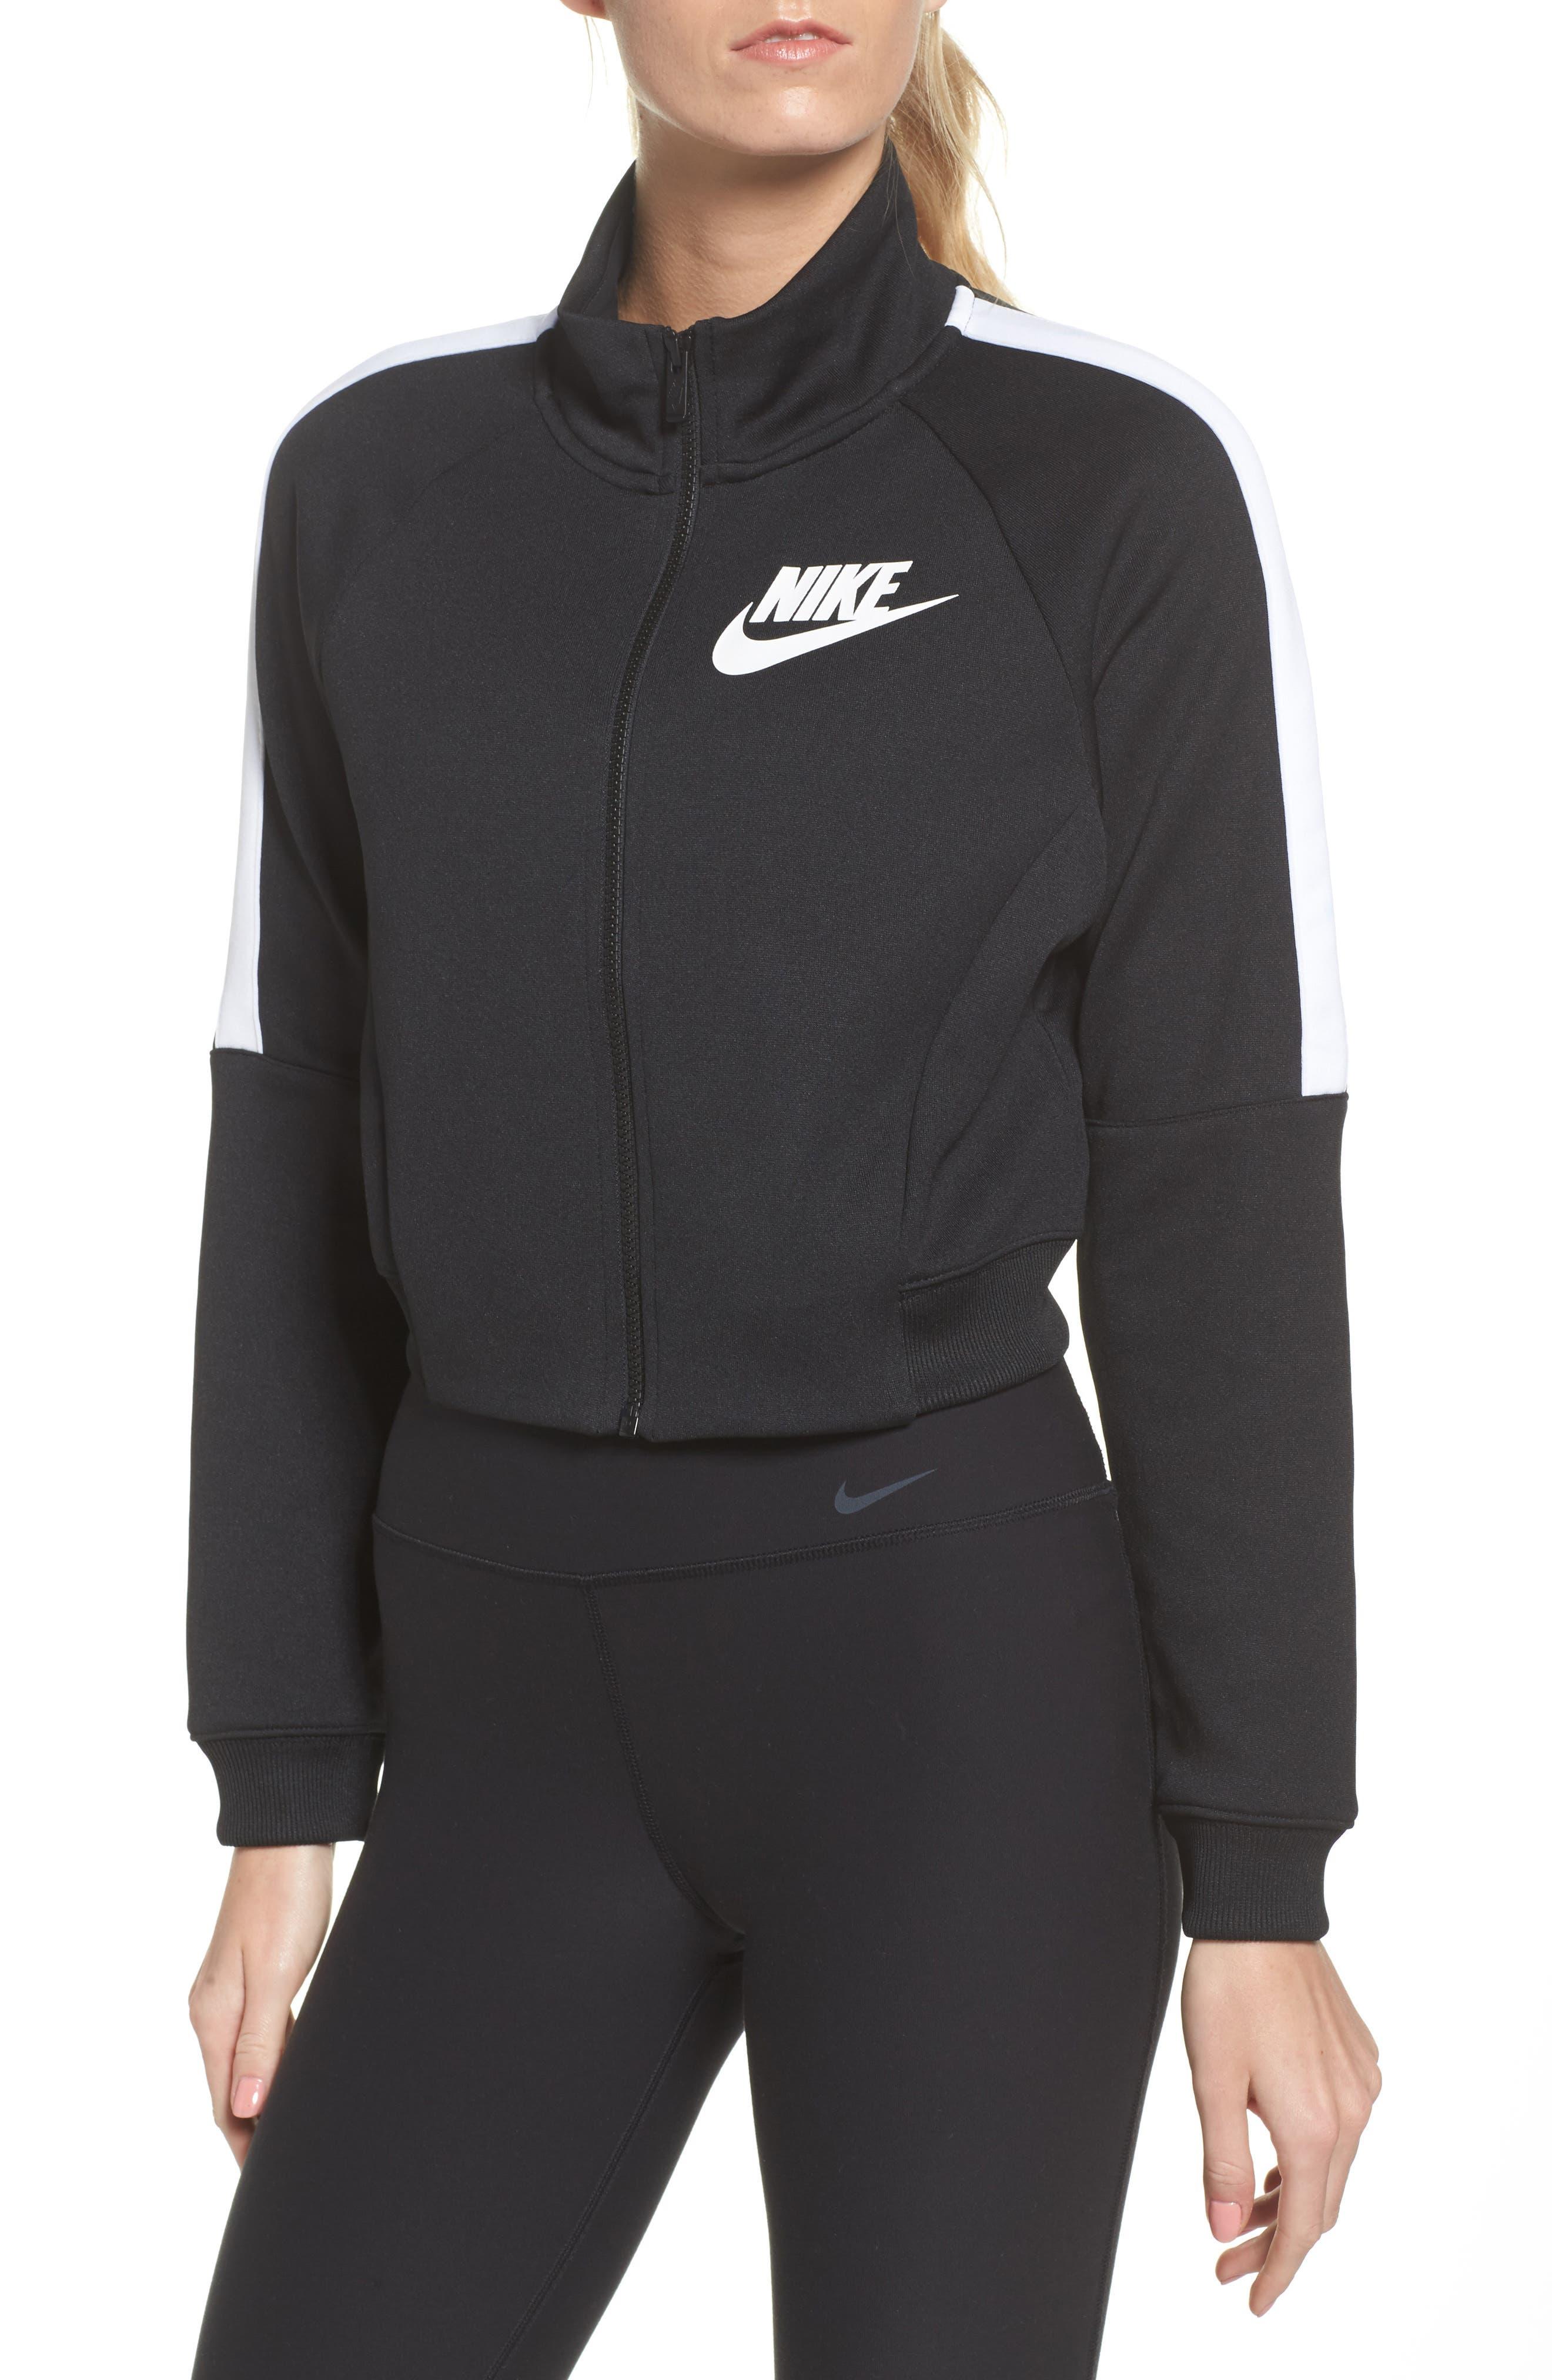 Sportswear N98 Jacket,                             Alternate thumbnail 4, color,                             Black/ White